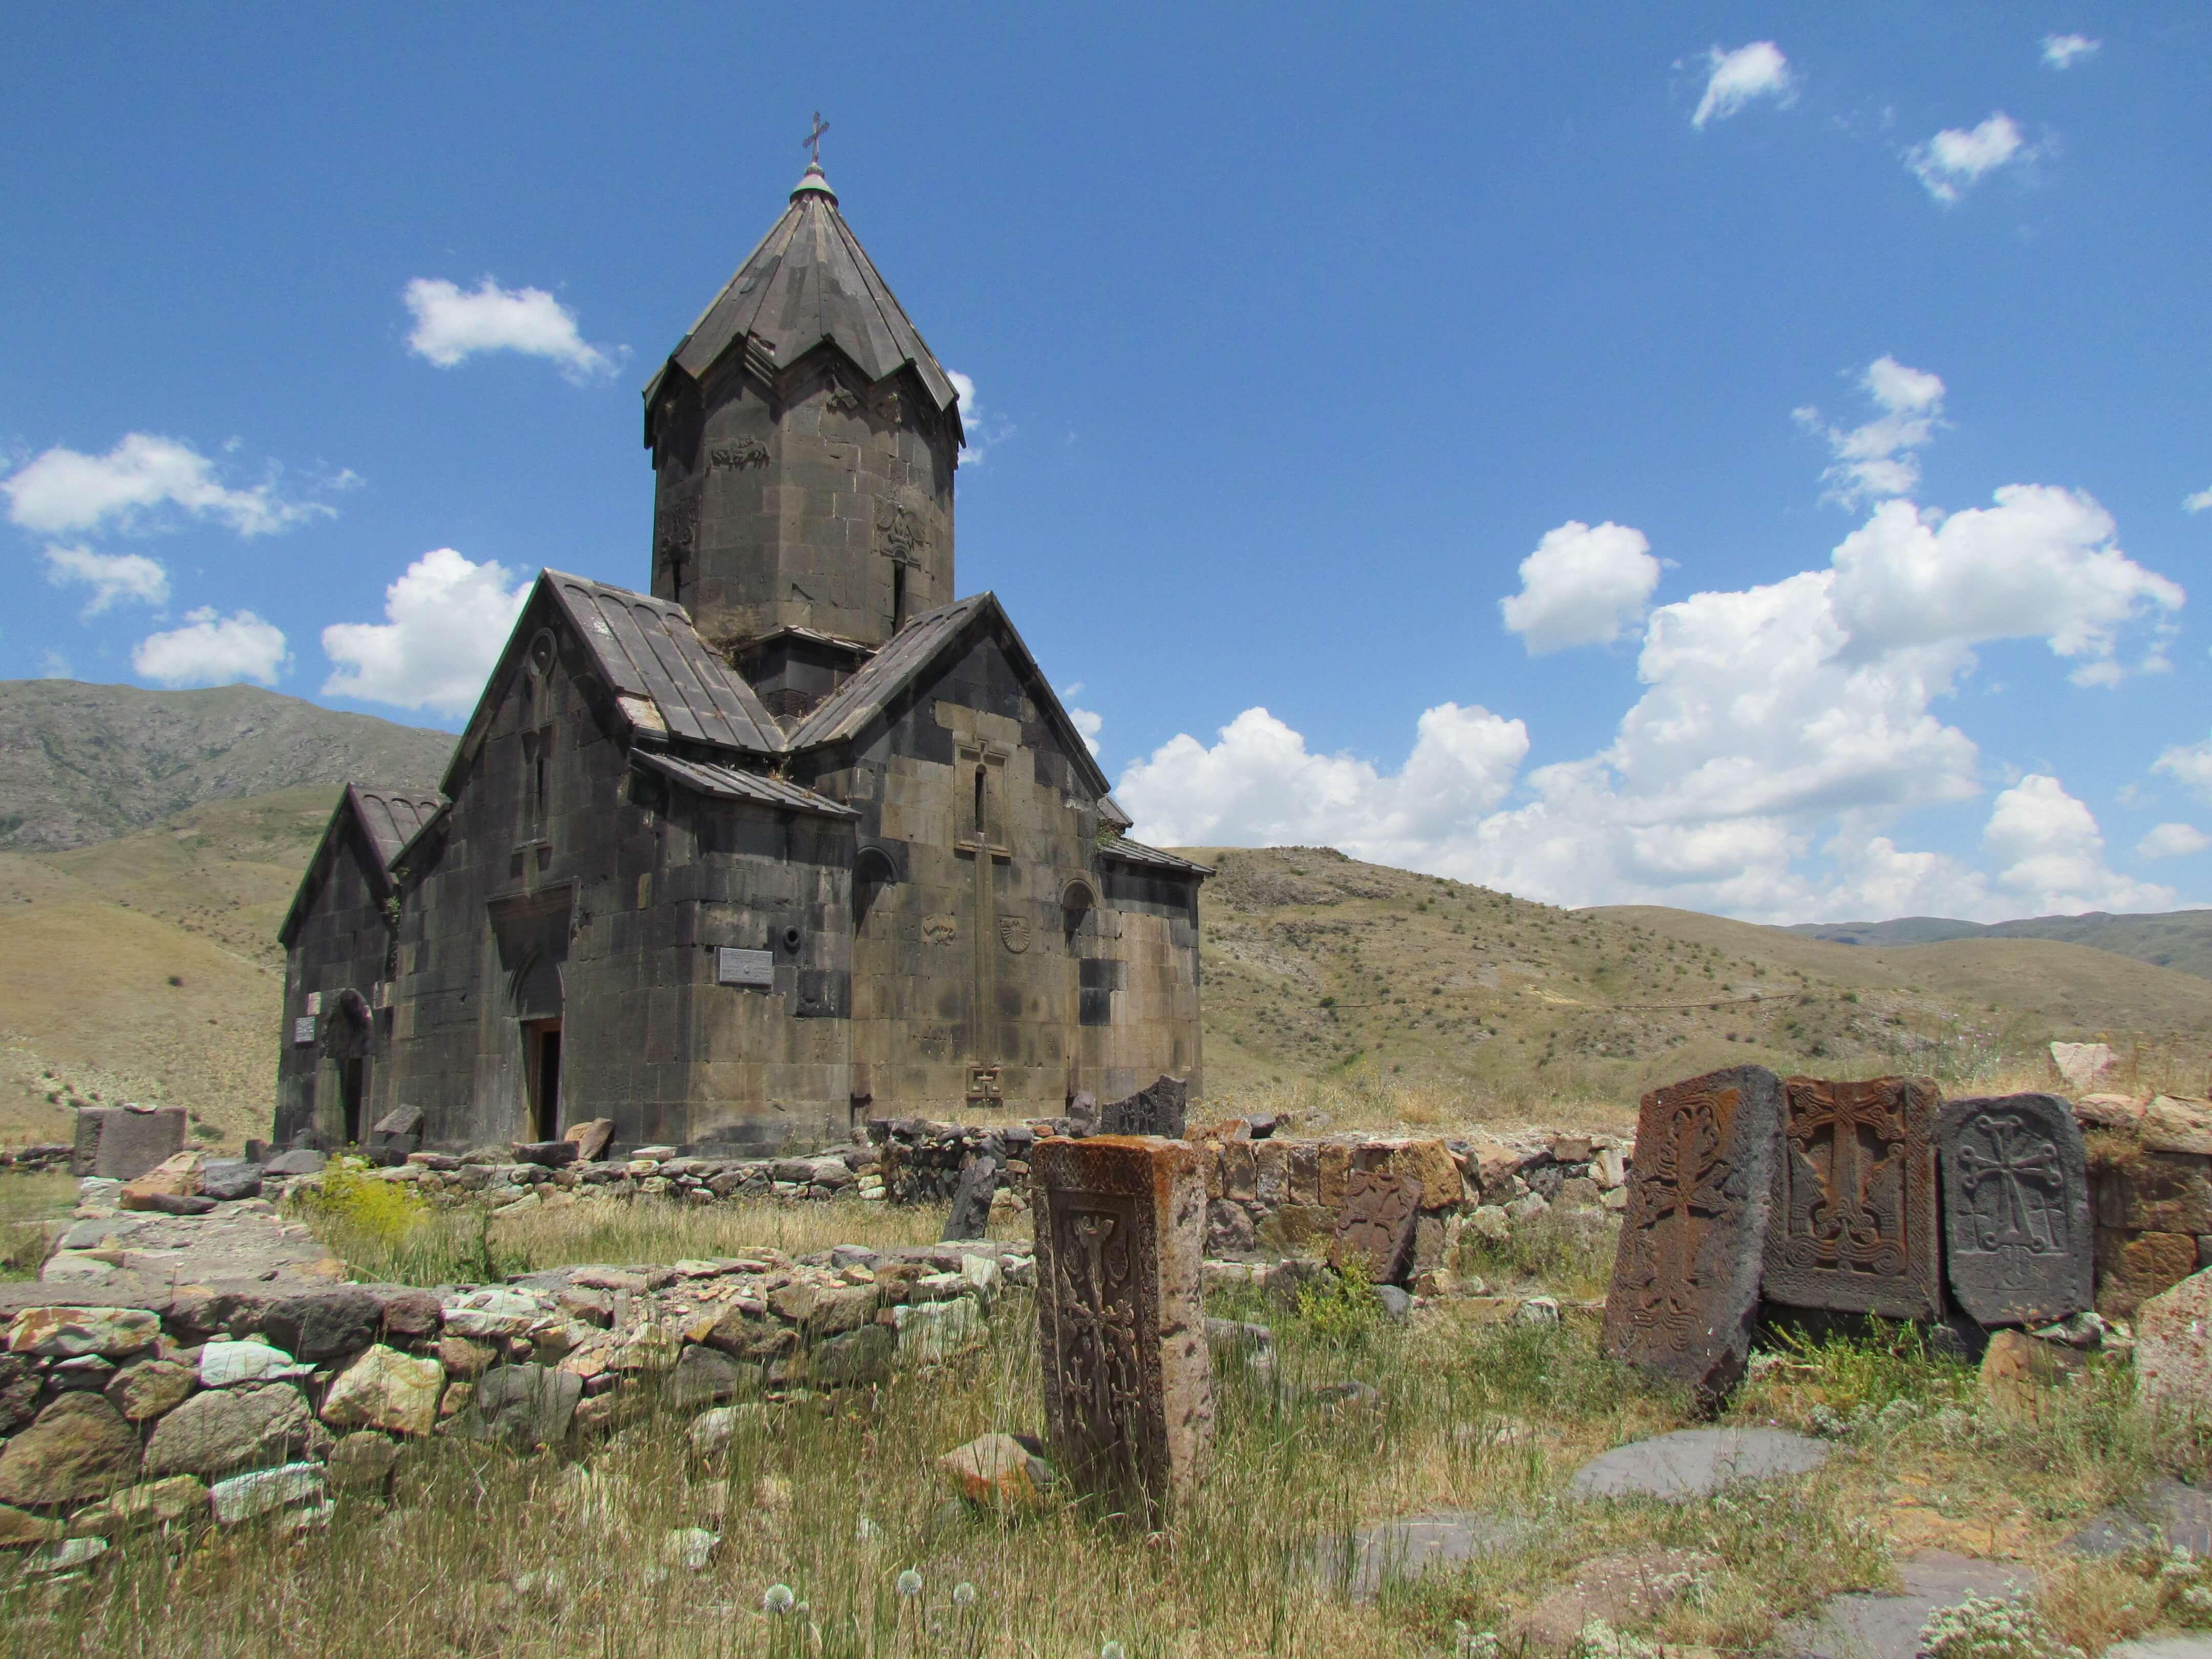 Gladzor Monastery